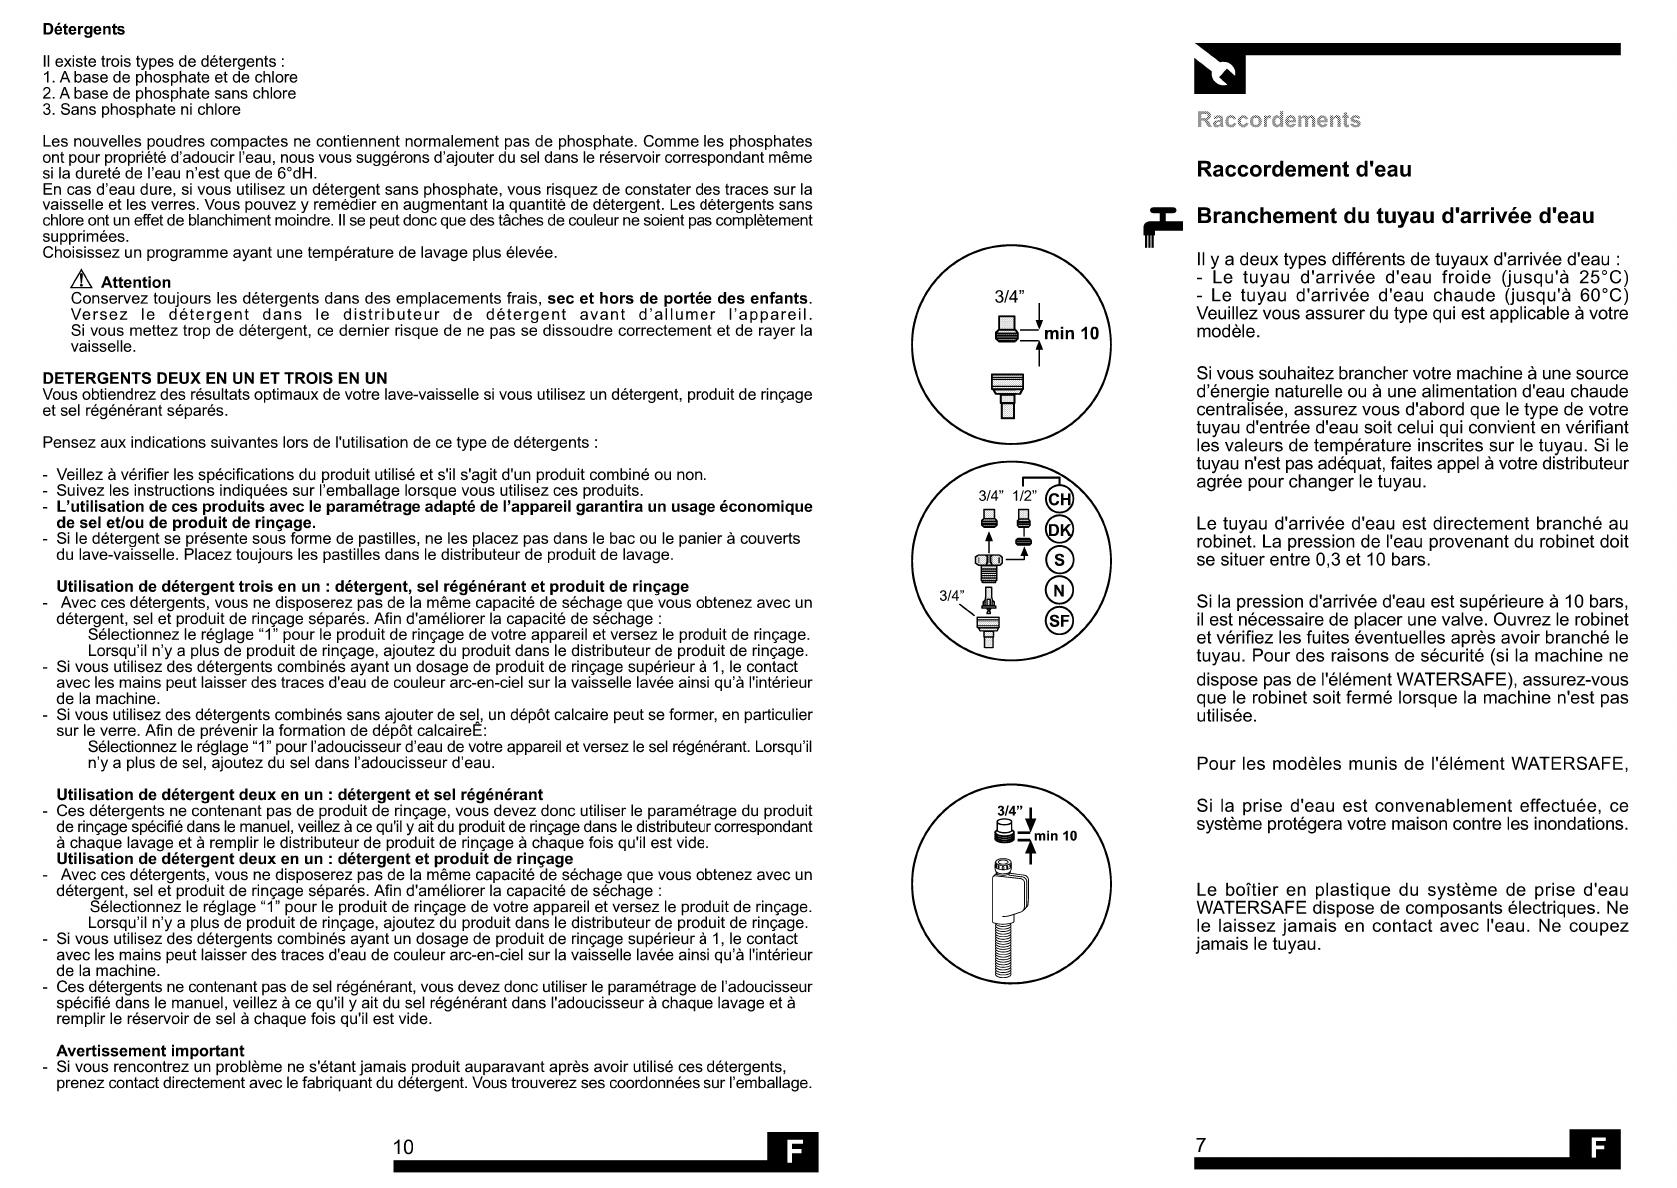 Handleiding Beko D 8879 Fd Pagina 9 Van 12 Francais